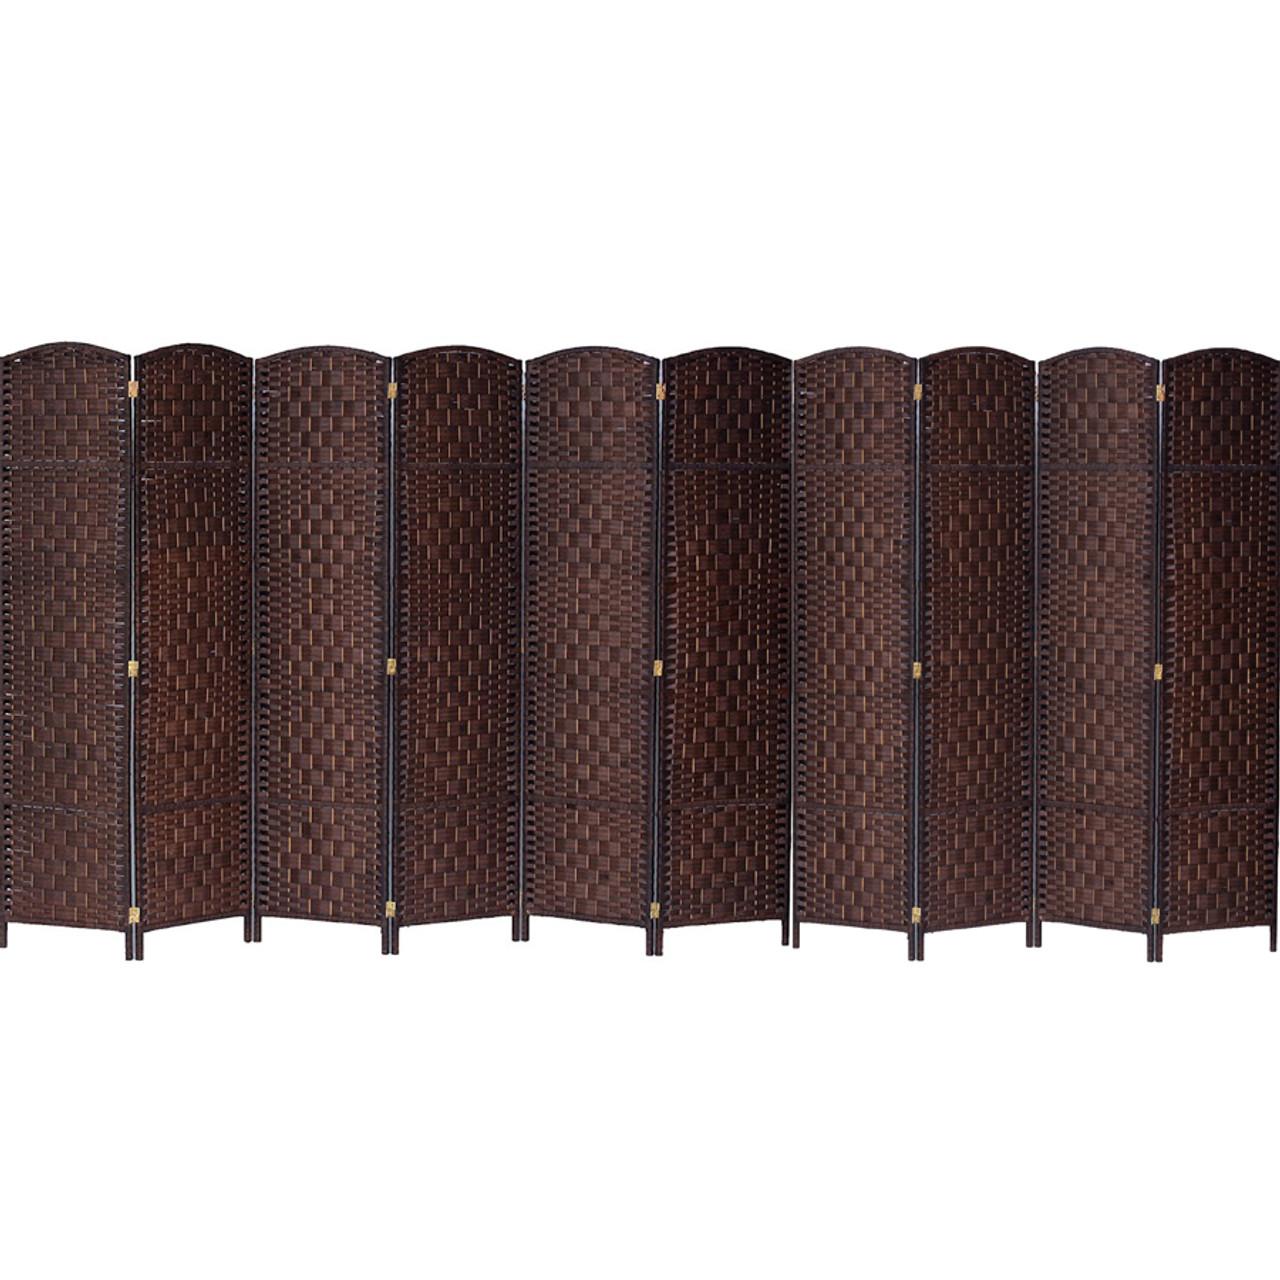 10 Panels Room Divider, Privacy Partition Screen Bamboo Woven Panel in USA, California, New York, New York City, Los Angeles, San Francisco, Pennsylvania, Washington DC, Virginia and Maryland